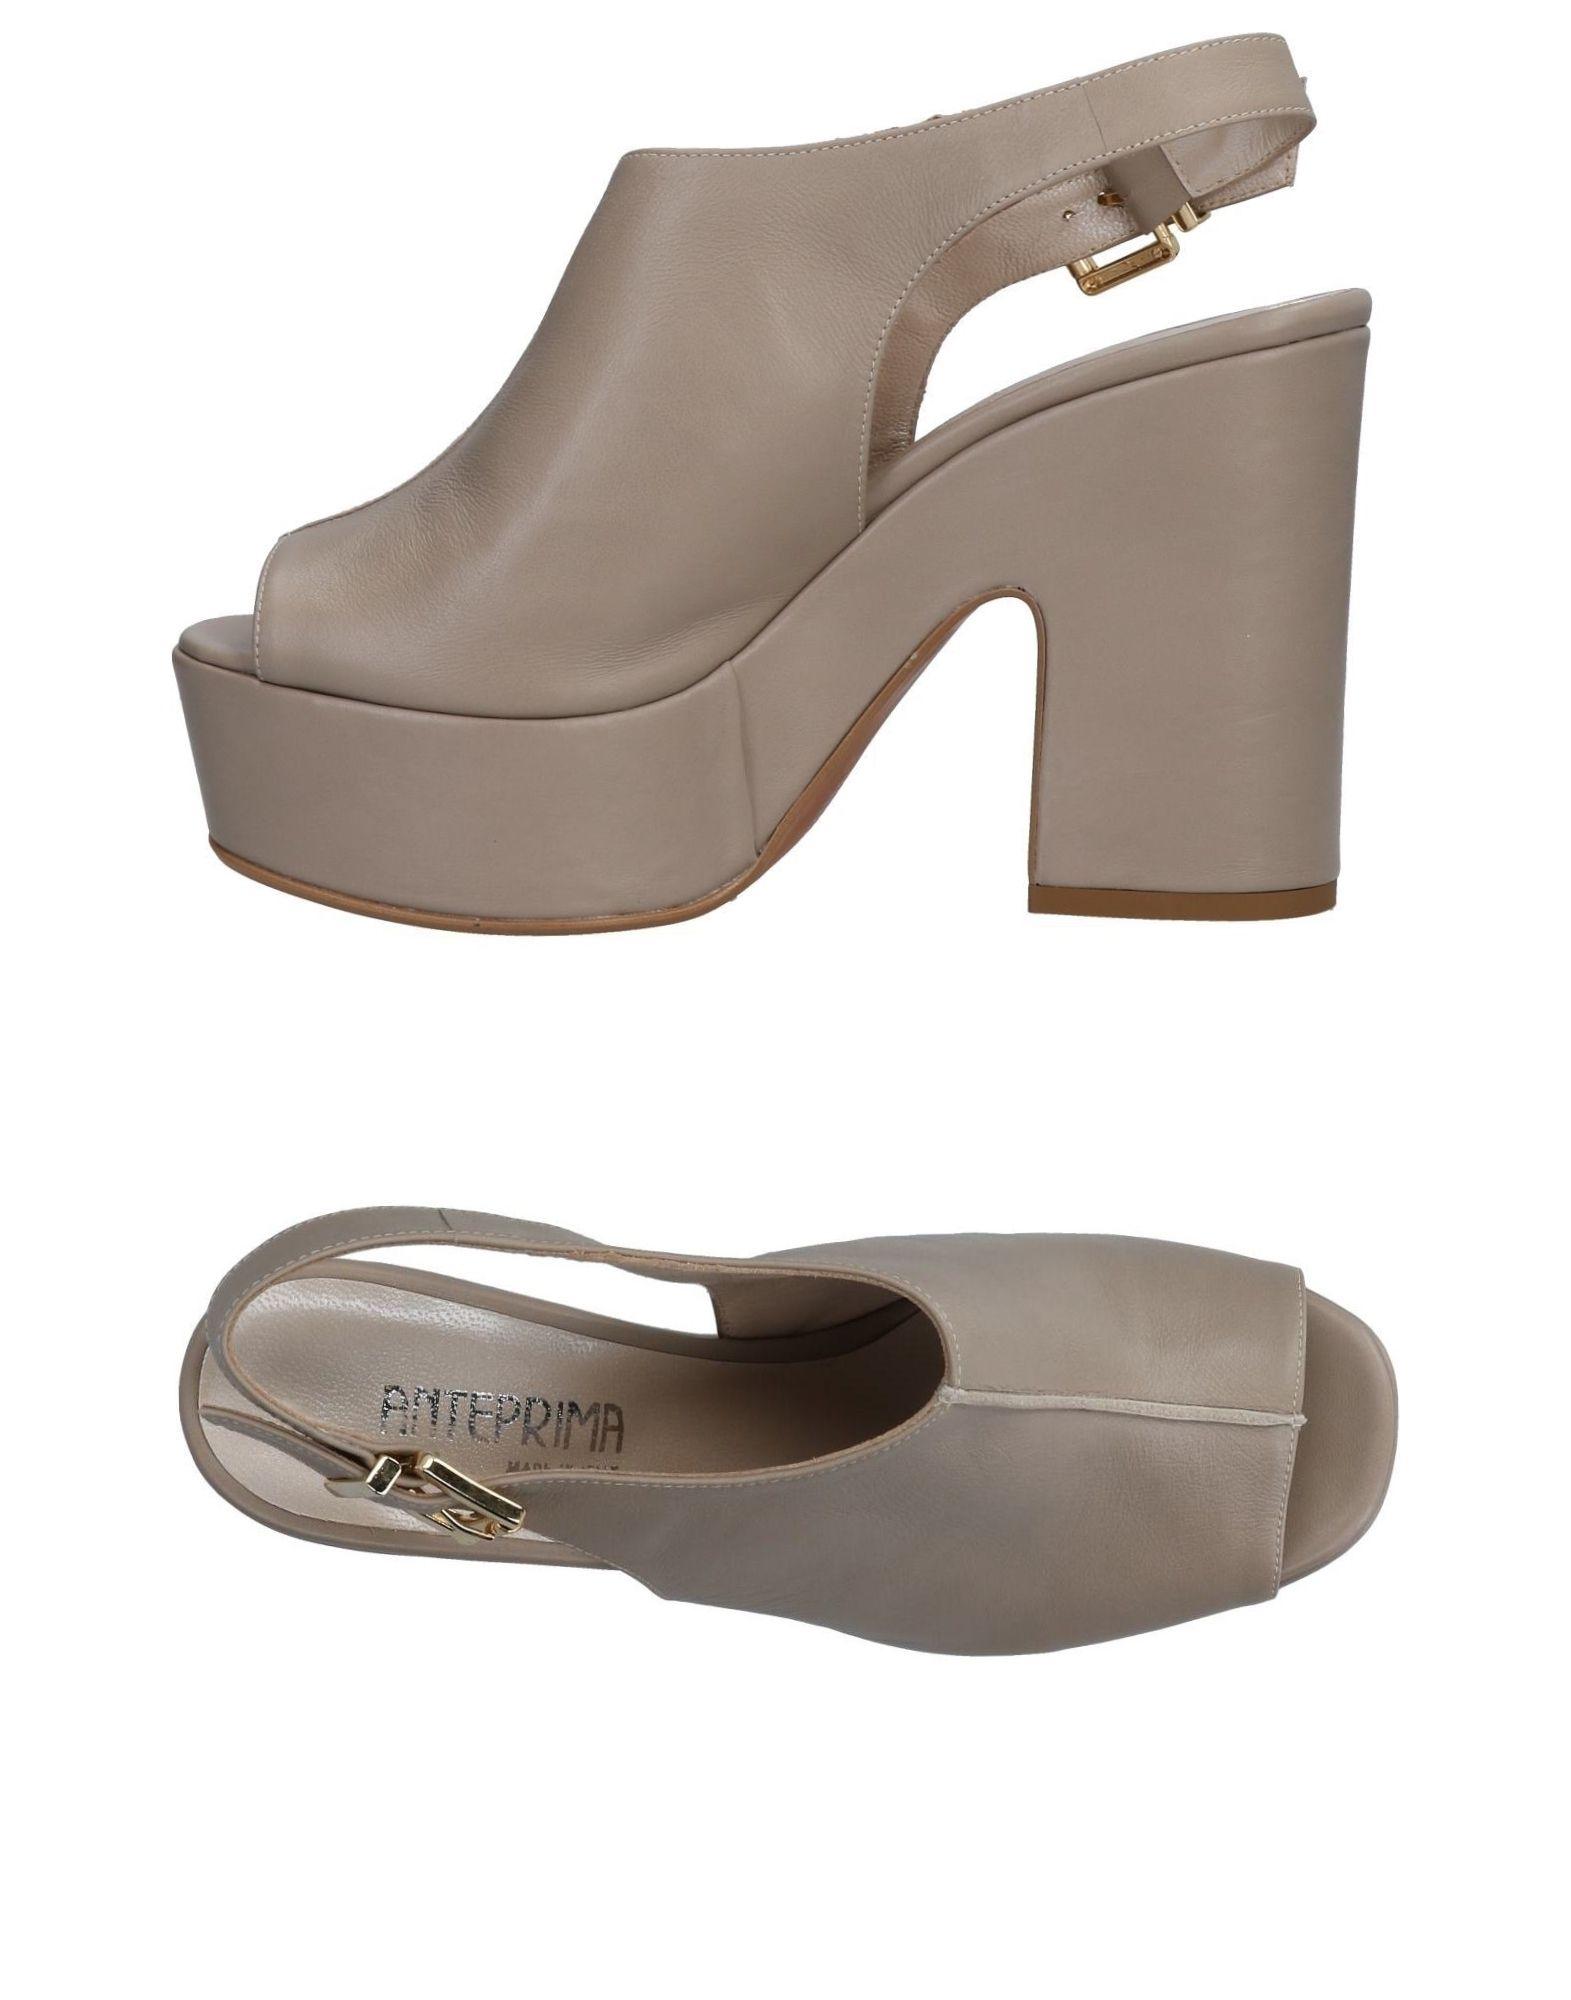 Moda Sandali Anteprima Donna - 11471304ER